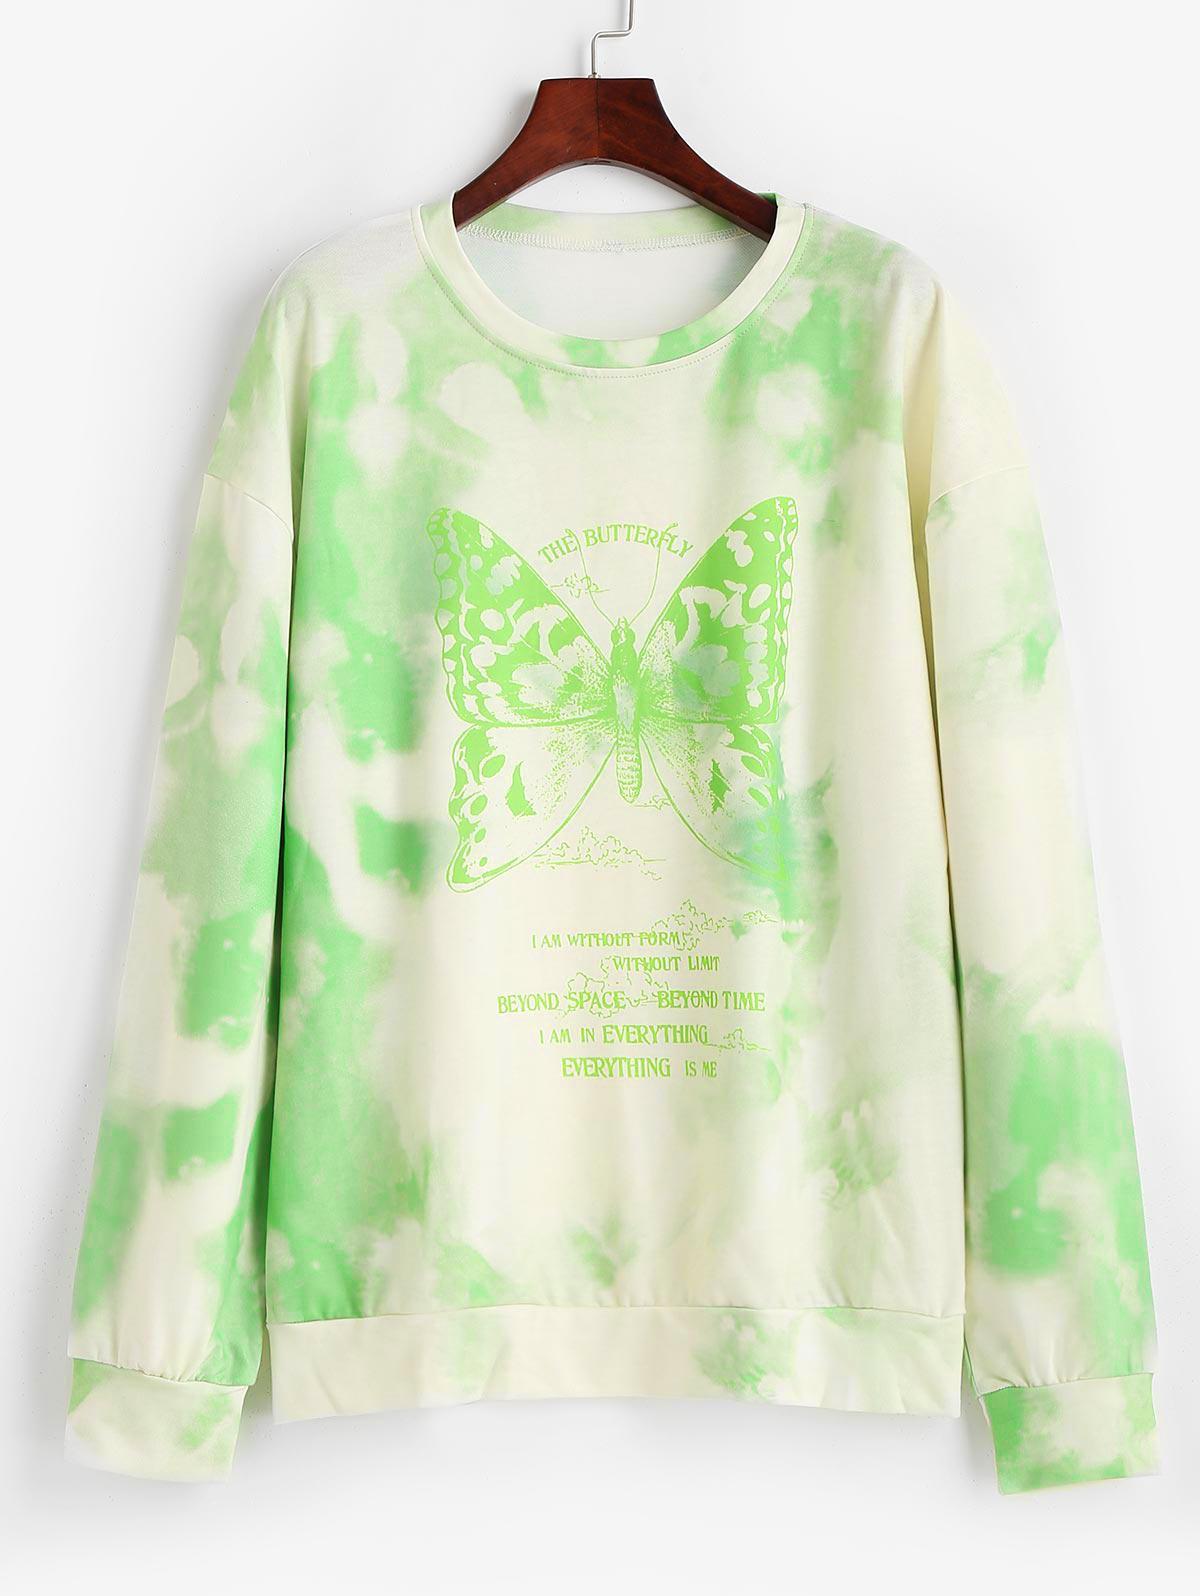 Sweat-shirt Tunique Boyfriend Papillon Imprimé 2xl - Zaful FR - Modalova